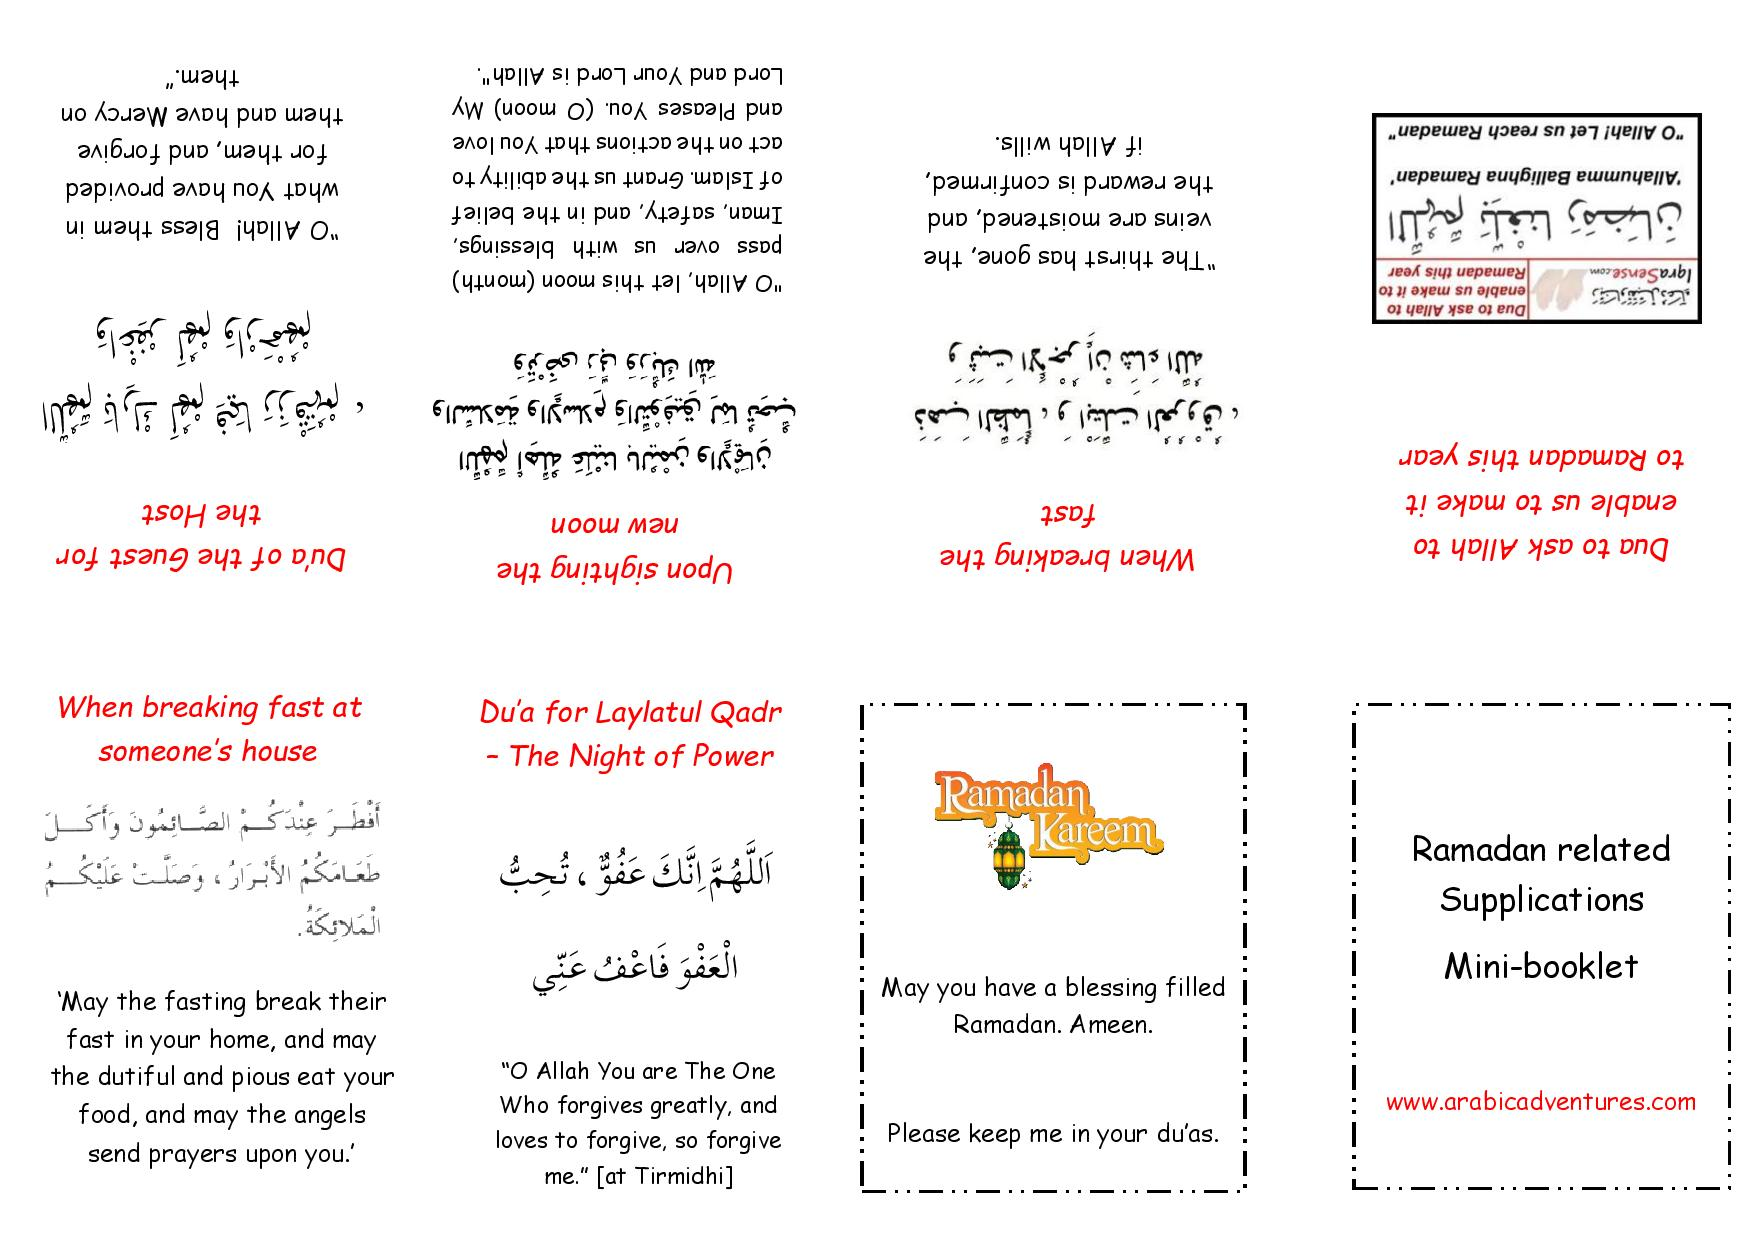 Ramadan Supplication Booklet